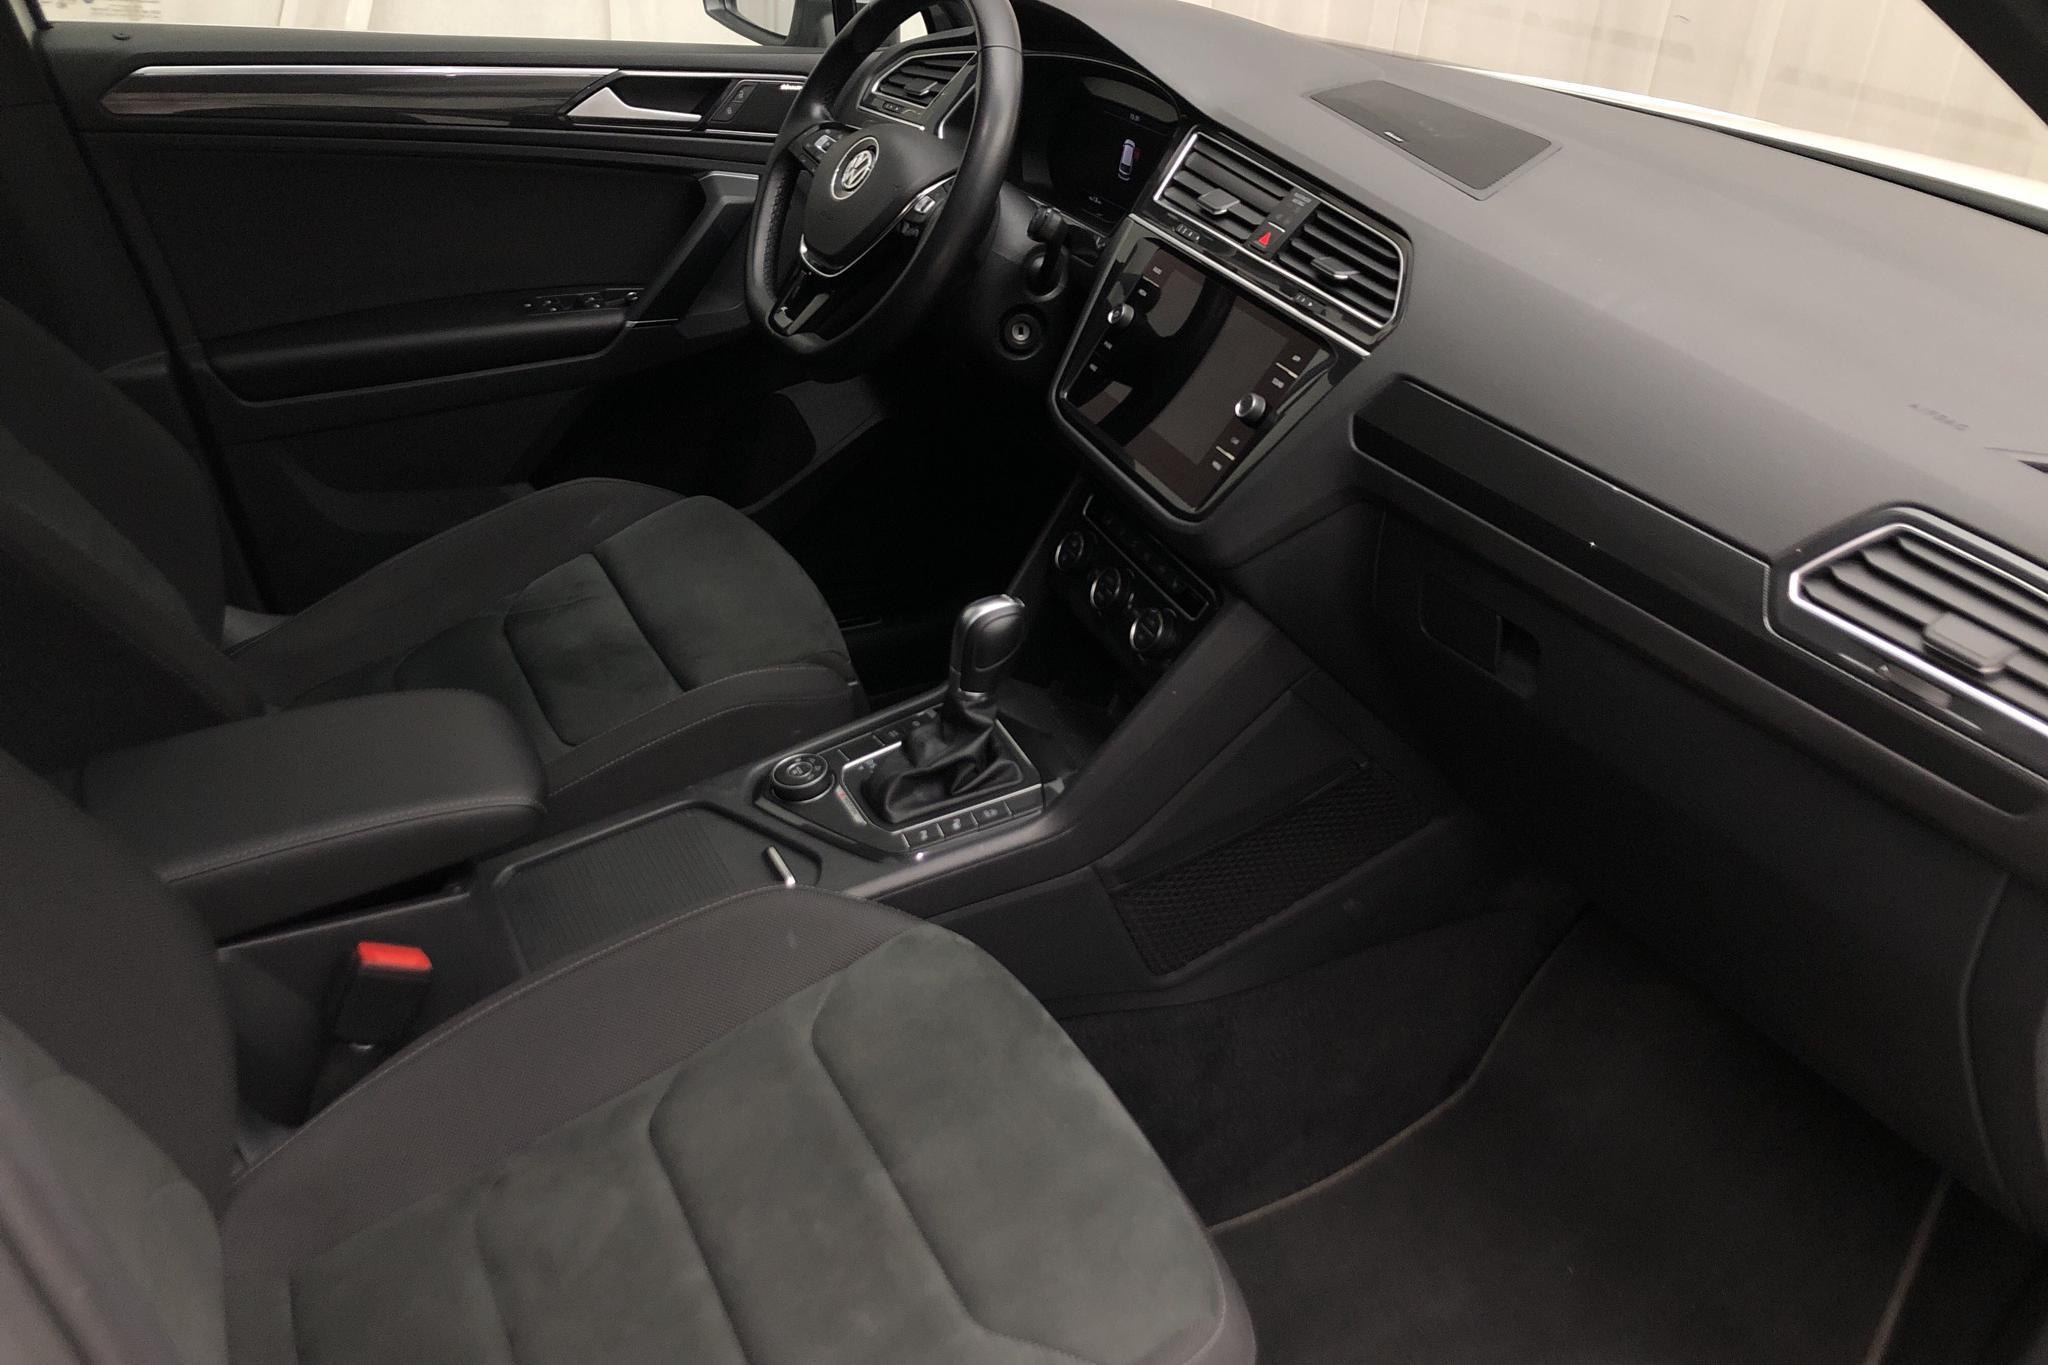 VW Tiguan 2.0 TDI 4MOTION (190hk) - 8 997 mil - Automat - vit - 2018